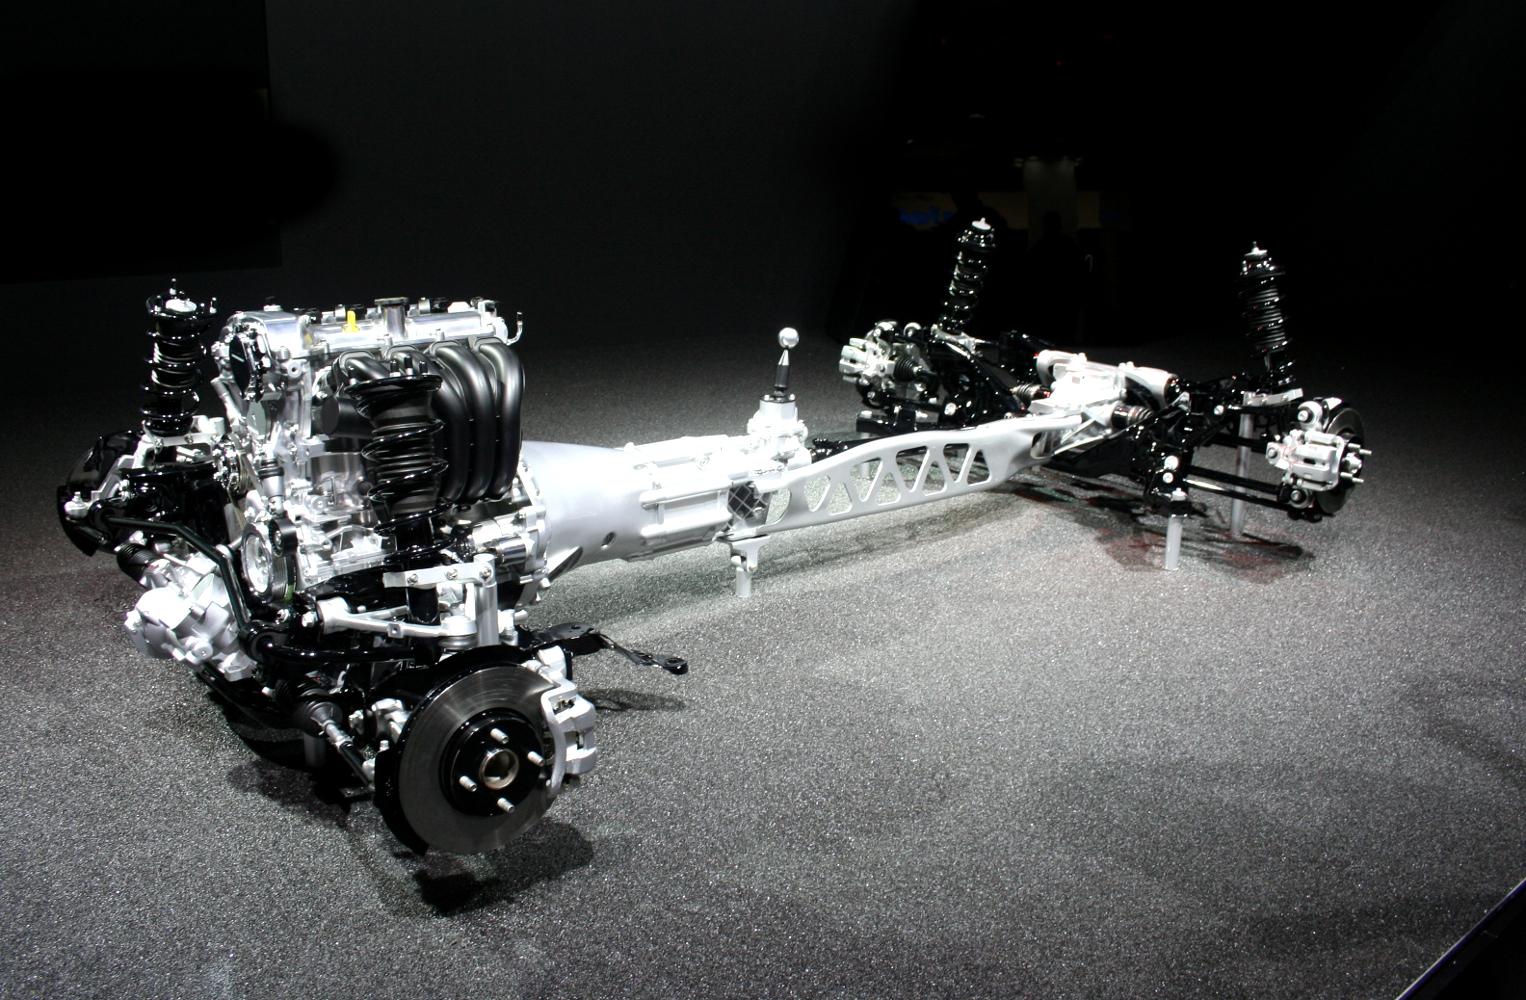 Châssis, trains roulants et groupe motopropulseur : Mazda MX-5